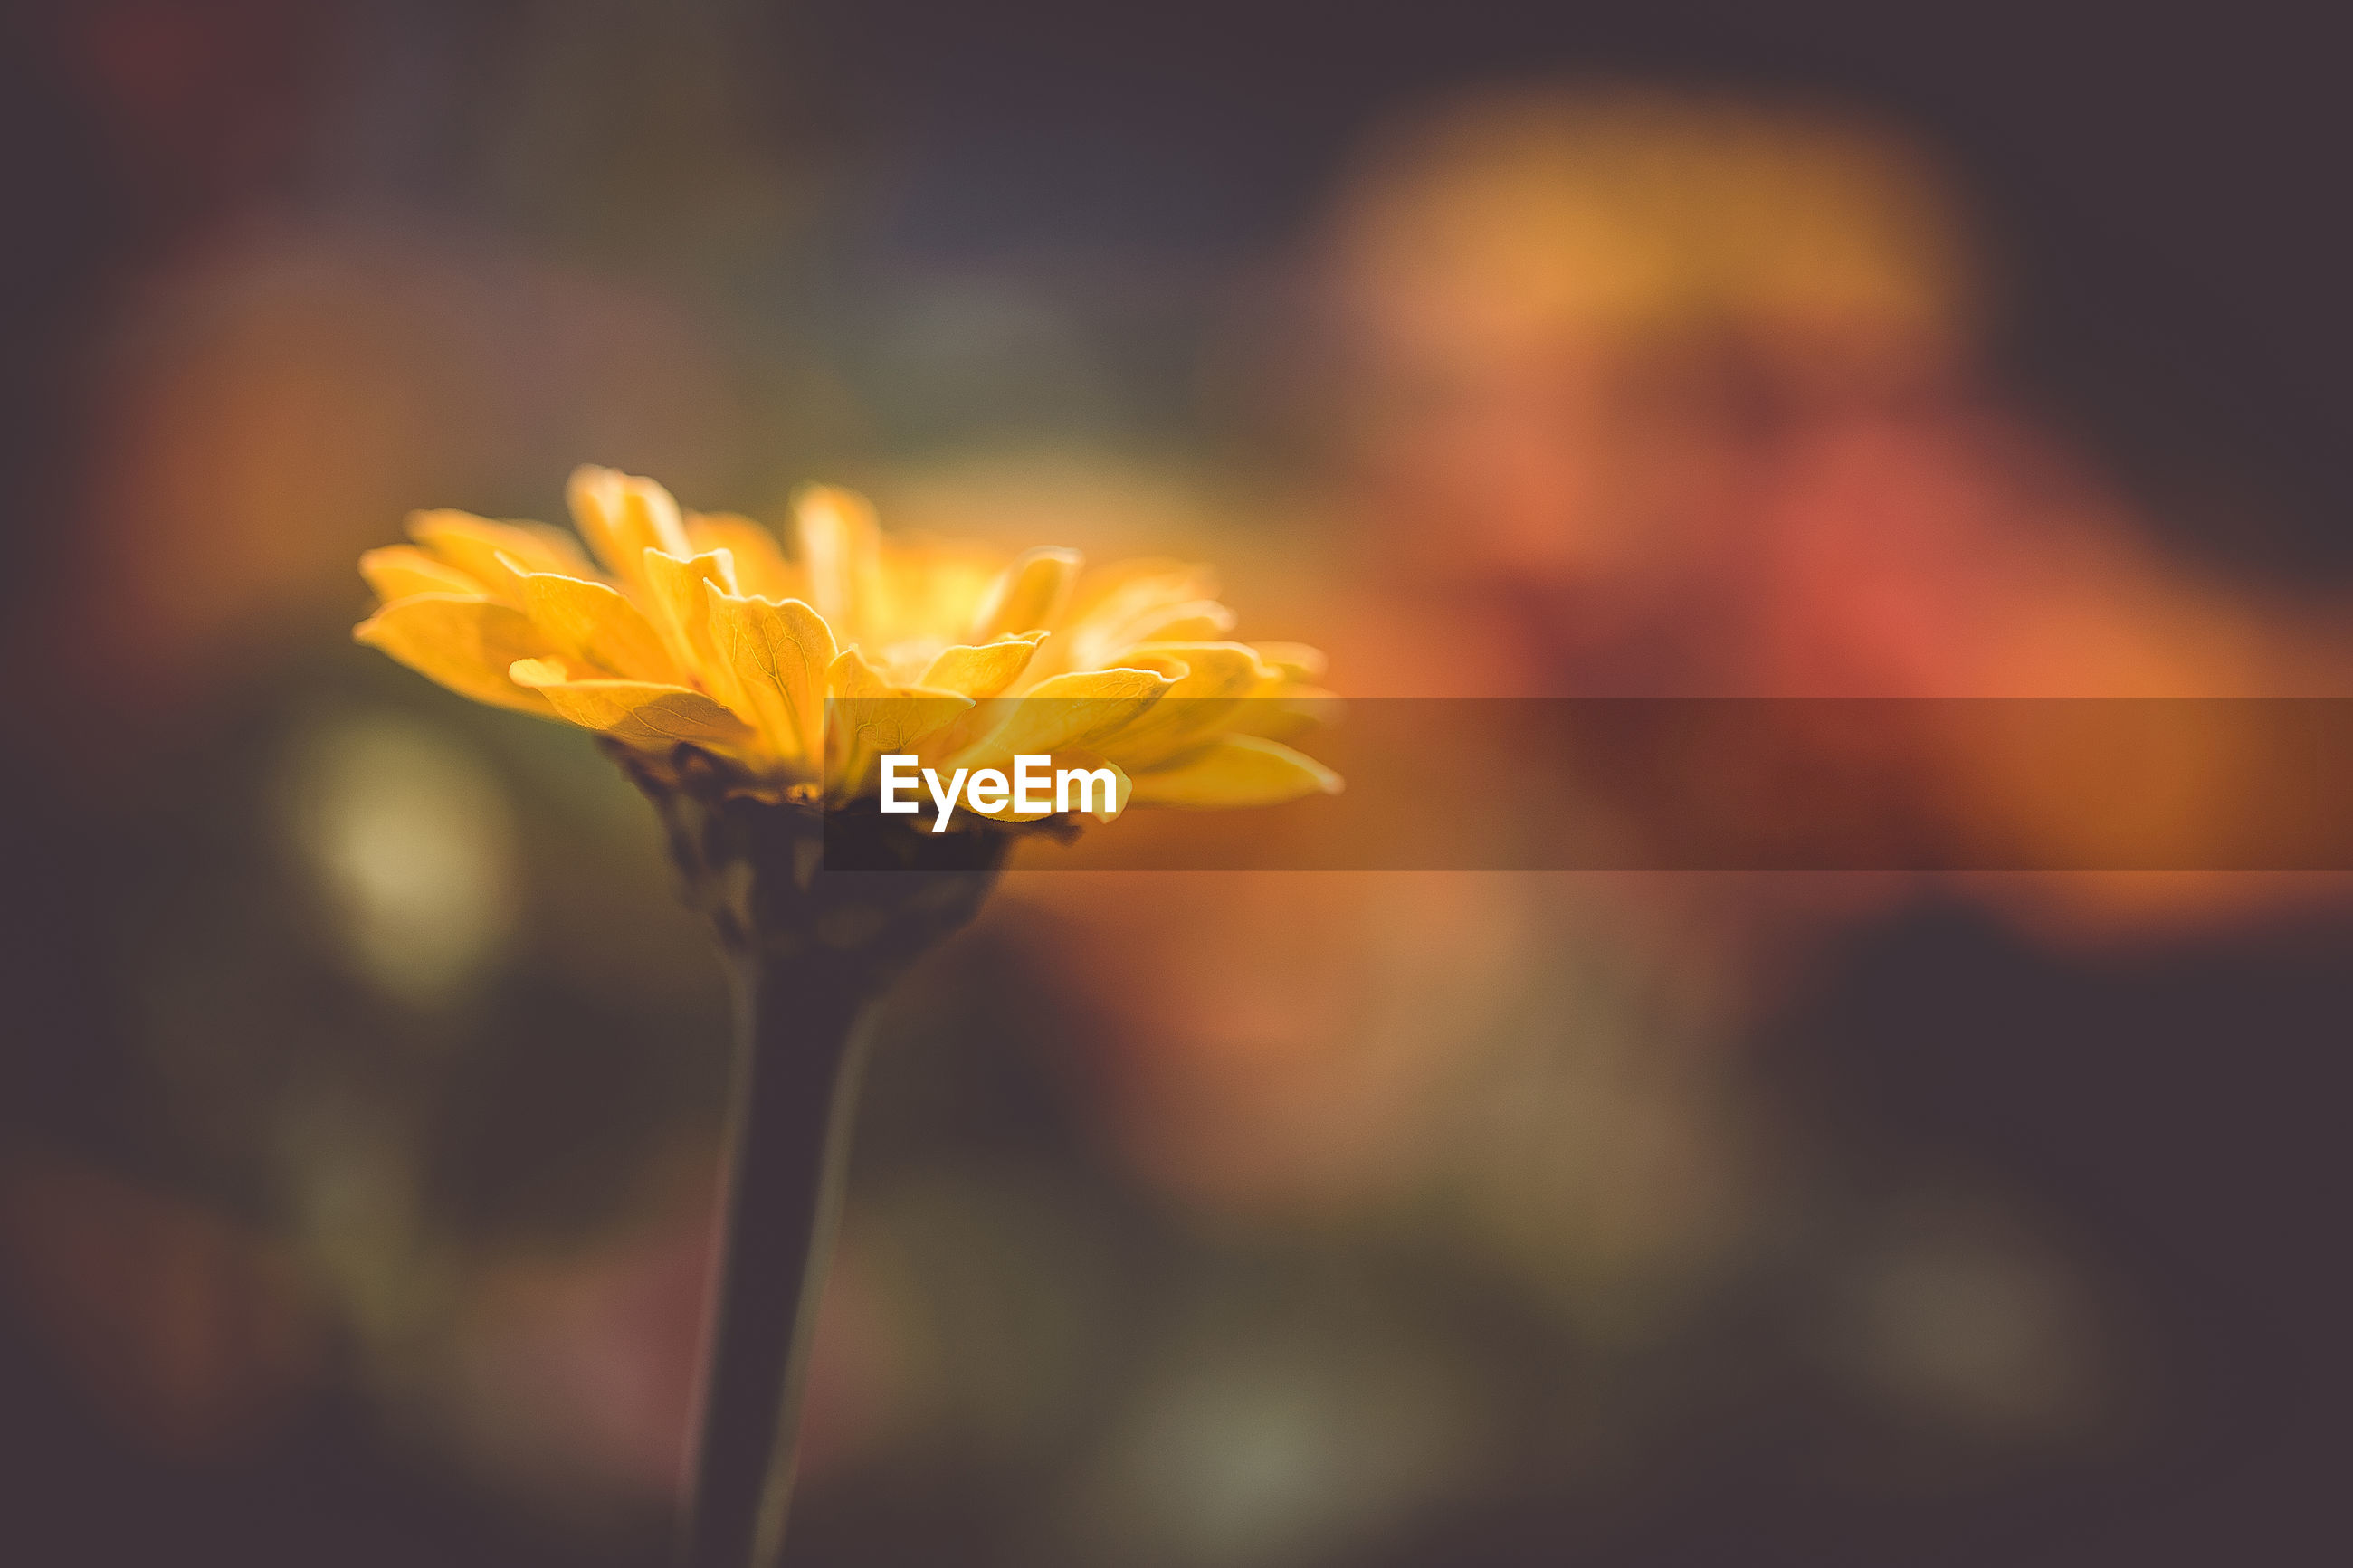 CLOSE-UP OF ORANGE FLOWER IN SUNLIGHT